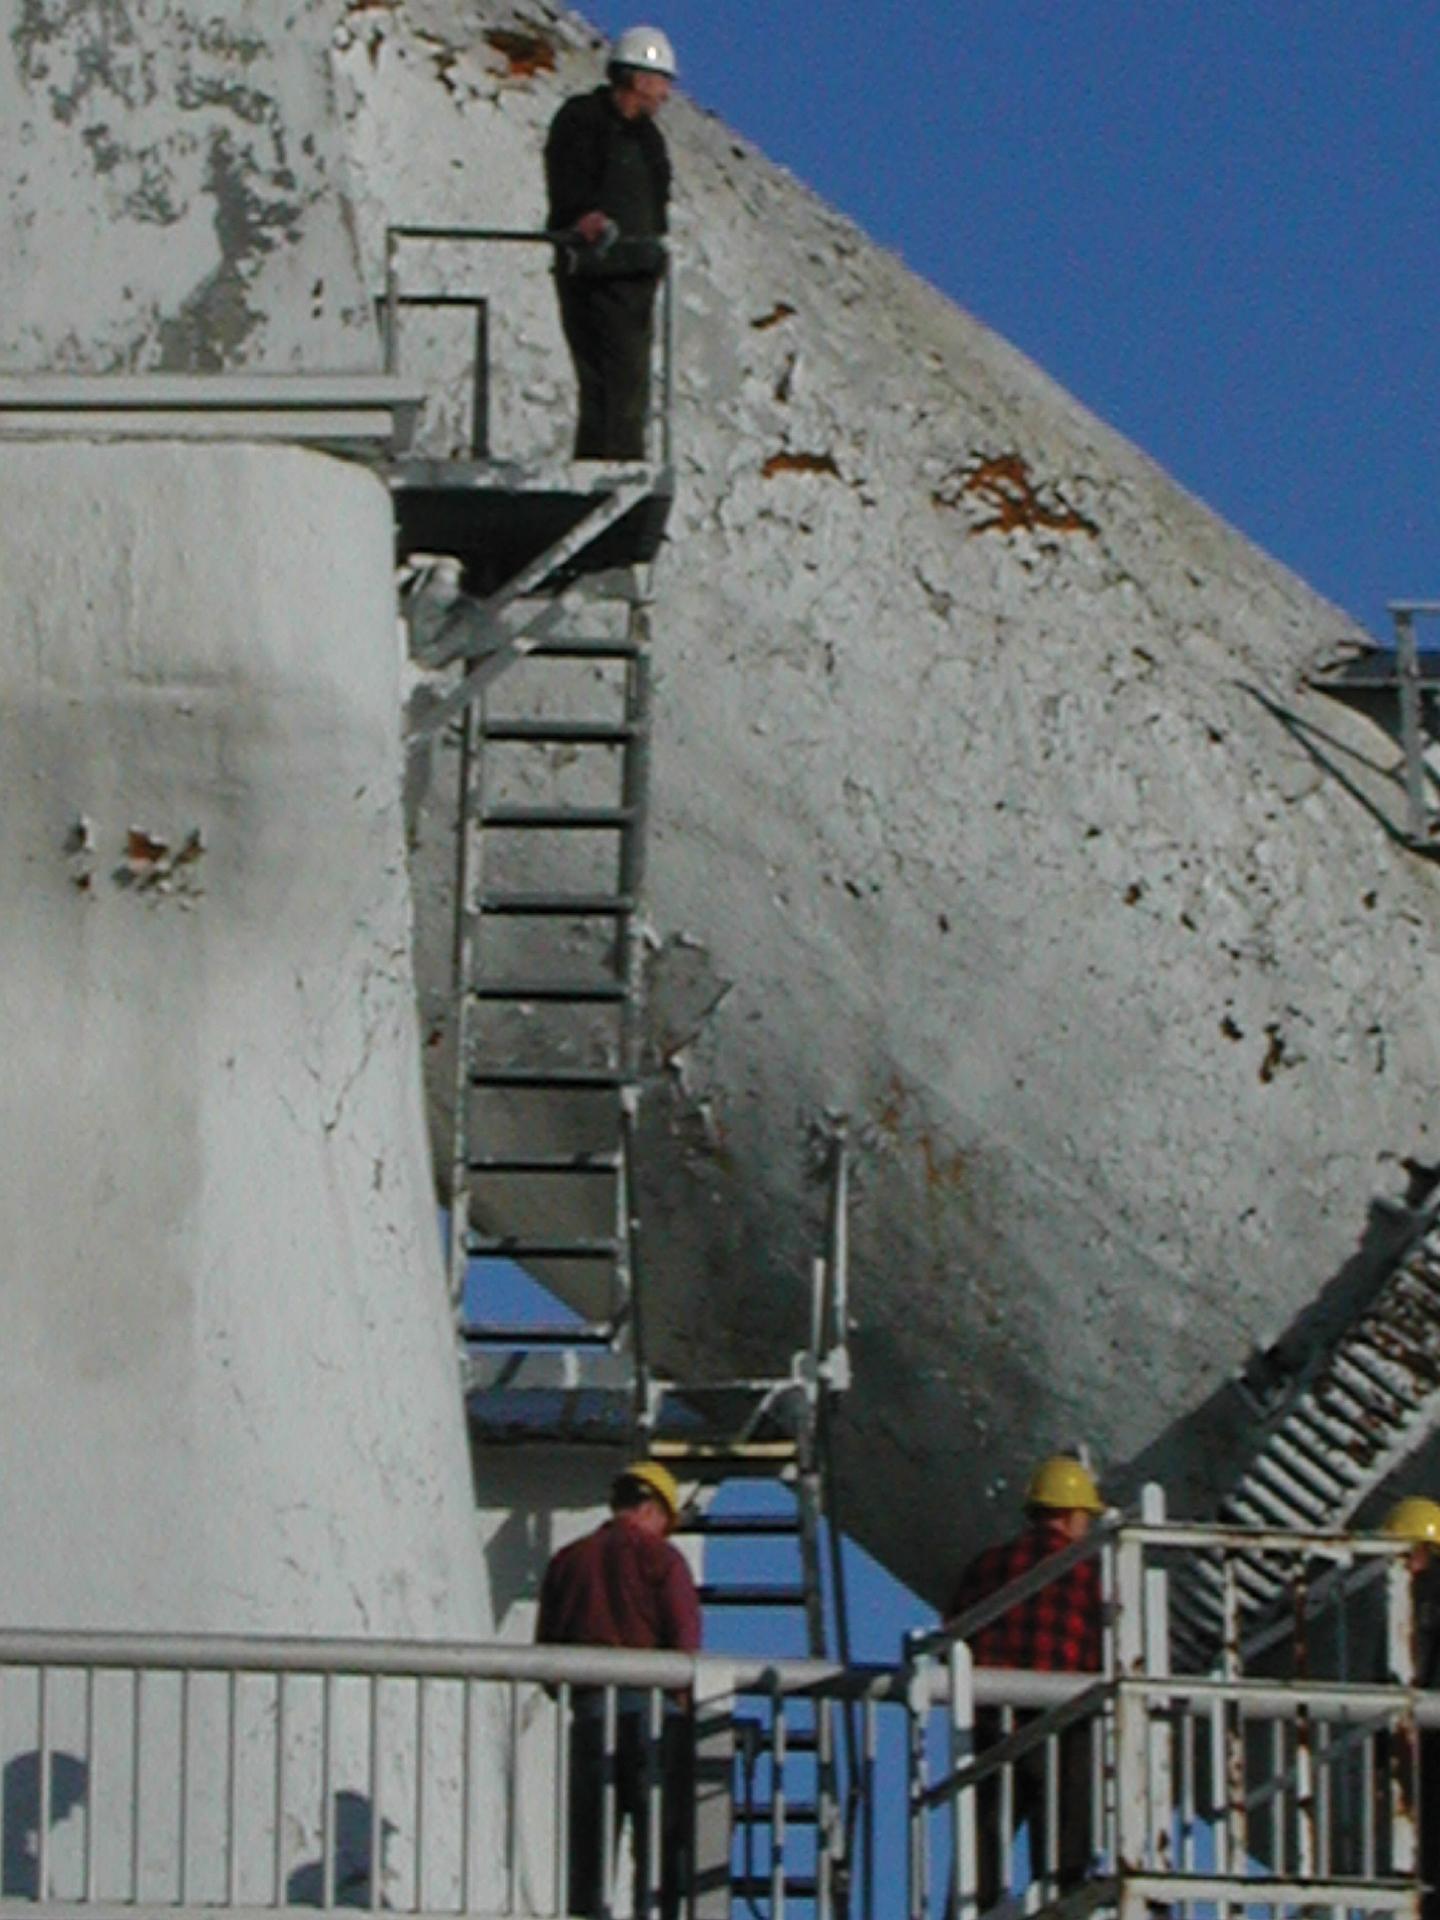 Maintenance on the 140-ft Polar Shaft